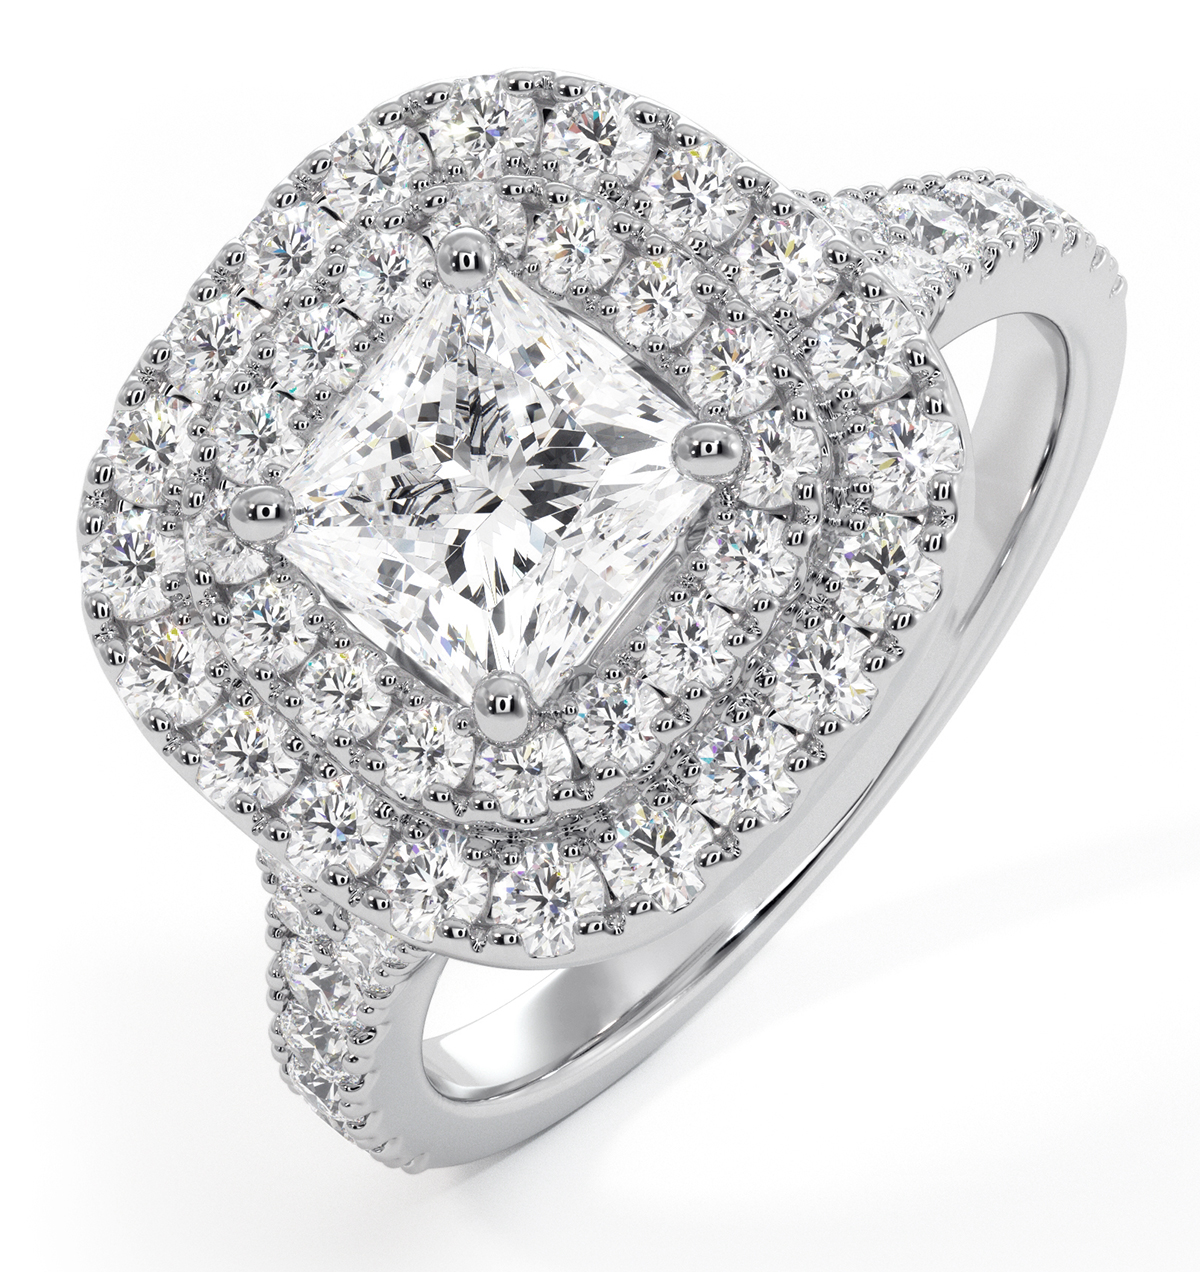 Cleopatra GIA Diamond Halo Engagement Ring 18K White Gold 1.70ct G/VS1 - image 1